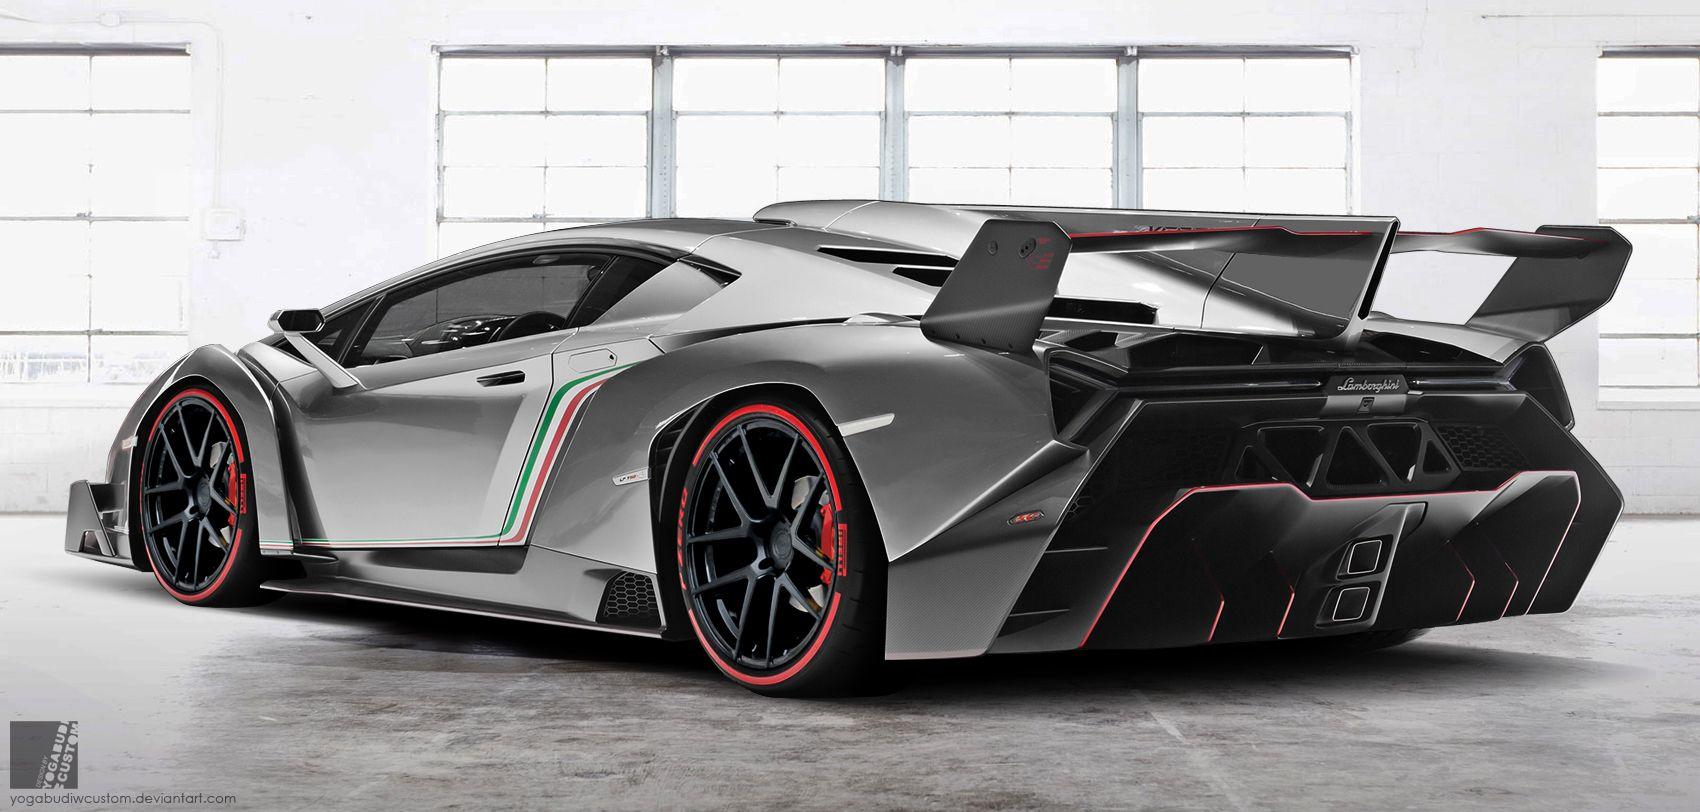 Populaire Black Lamborghini Aventador Wallpaper | Vehicles | Pinterest  FO87